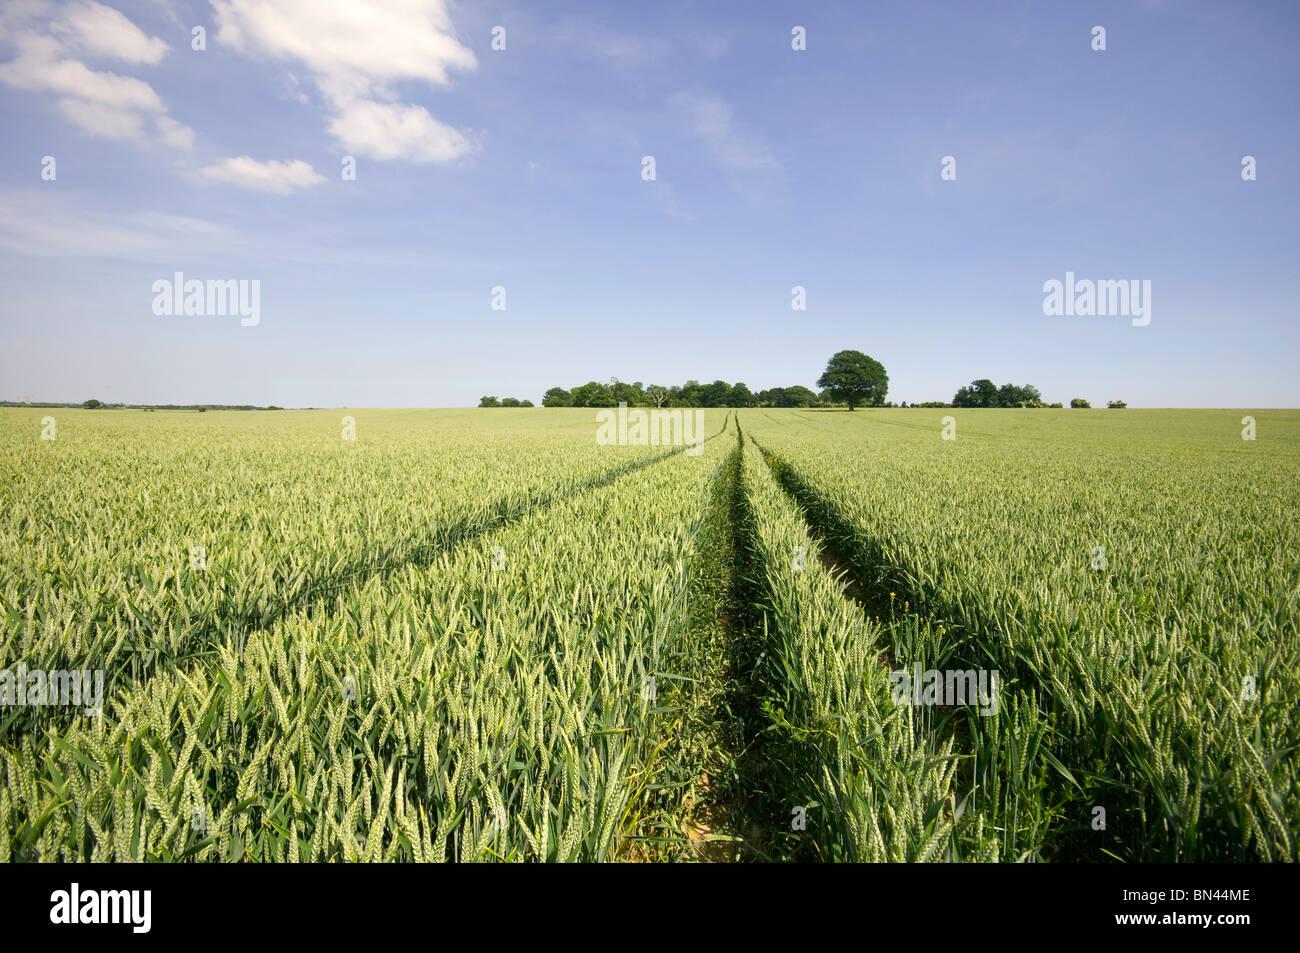 field of wheat kent england UK - Stock Image